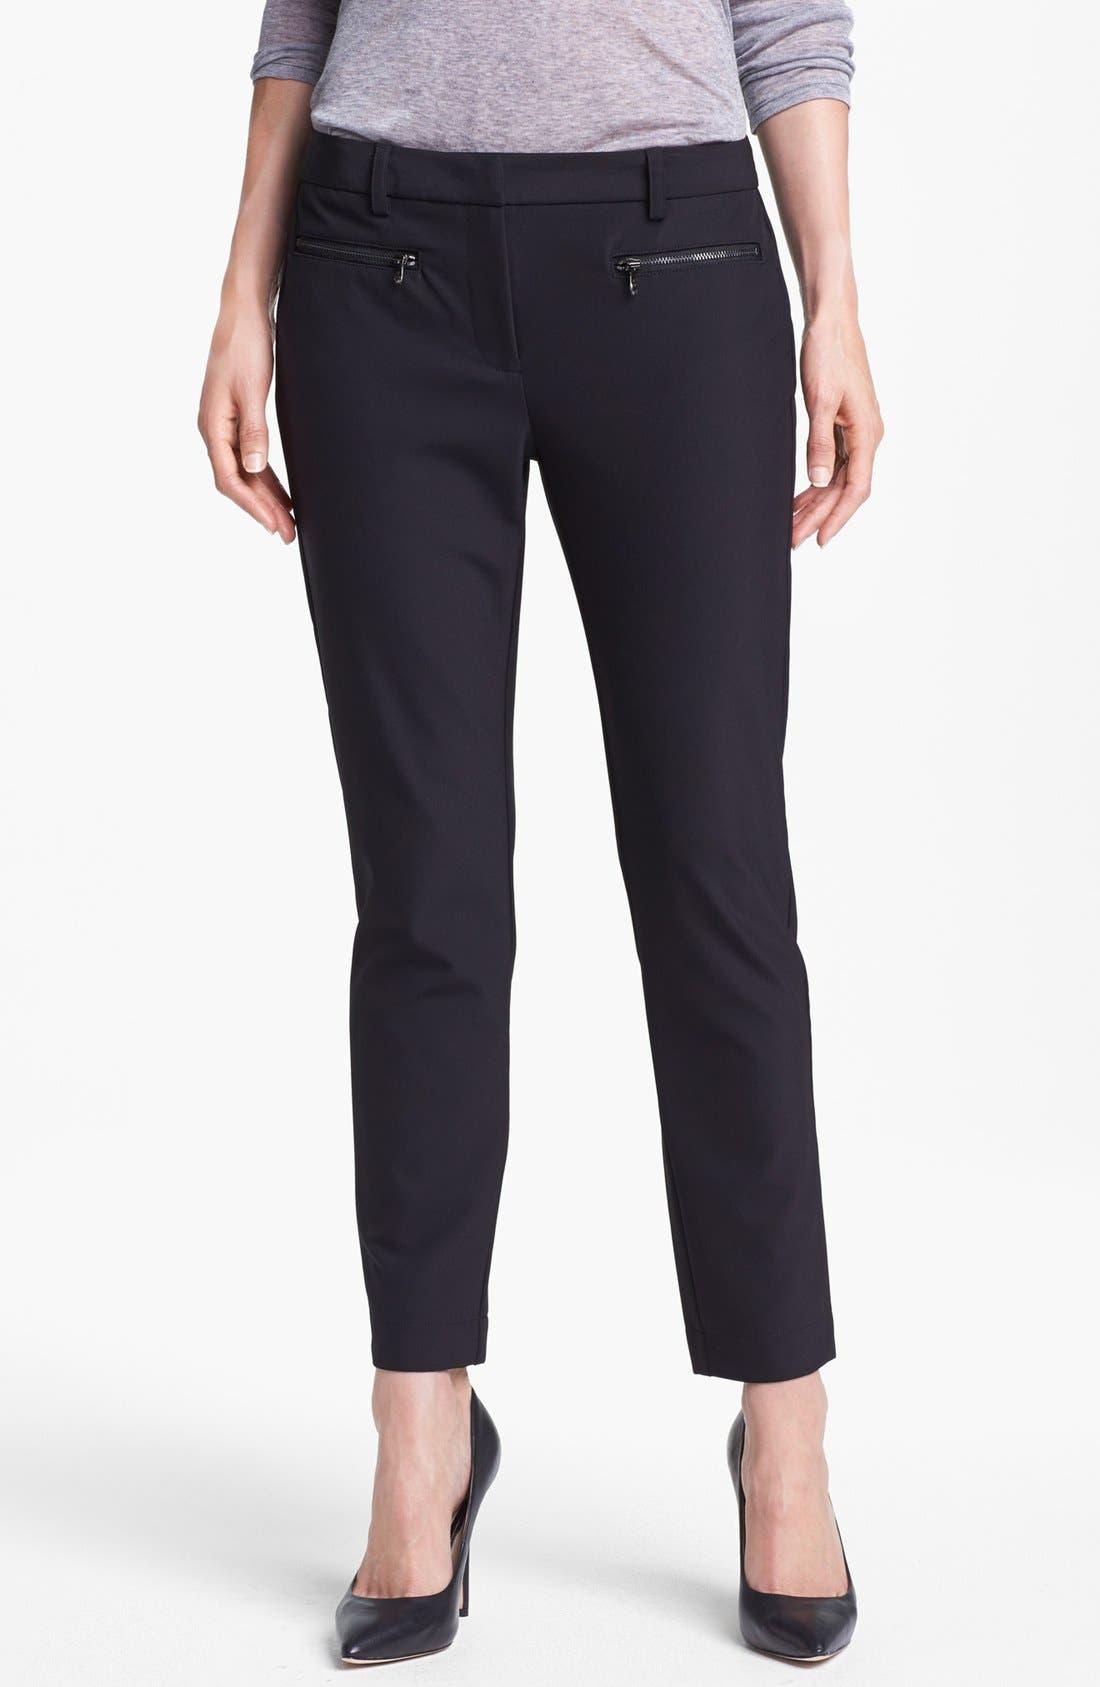 Alternate Image 1 Selected - Kenneth Cole New York 'Alison' Zip Pocket Slim Pants